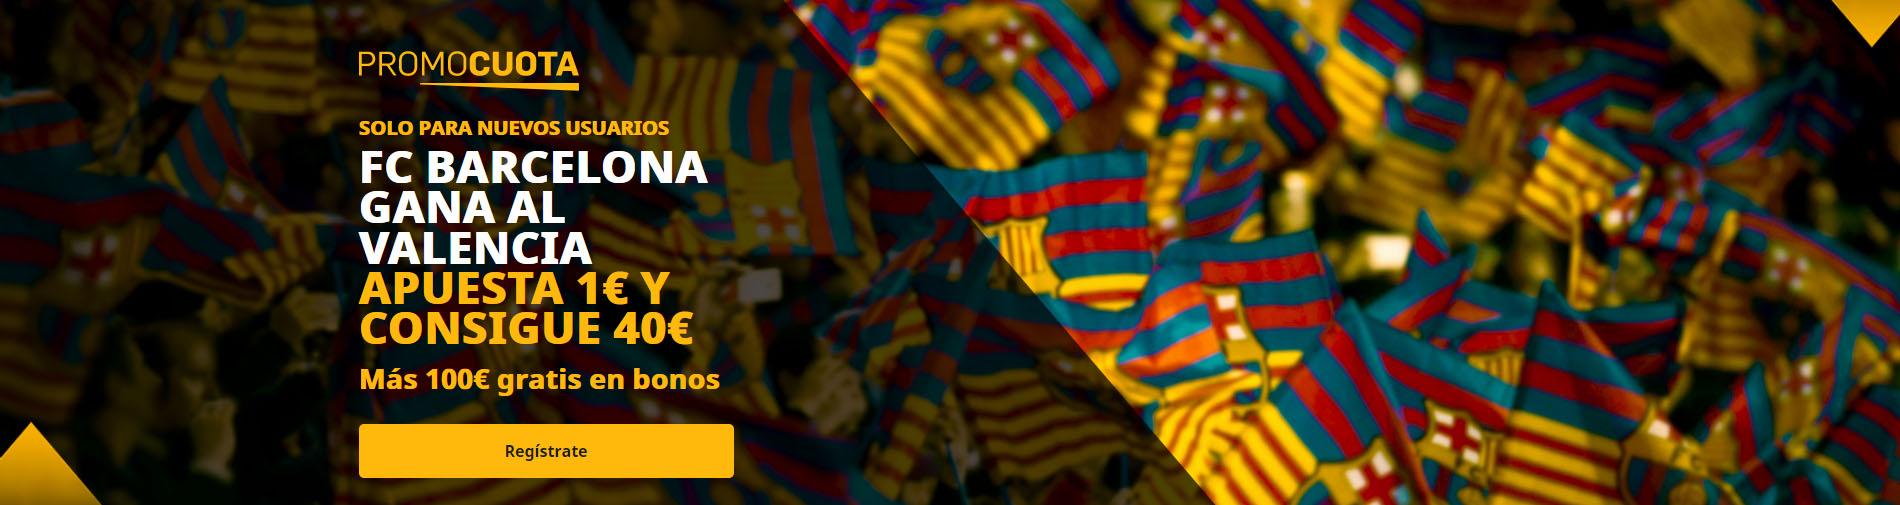 Promocuota Barcelona vence al Valencia